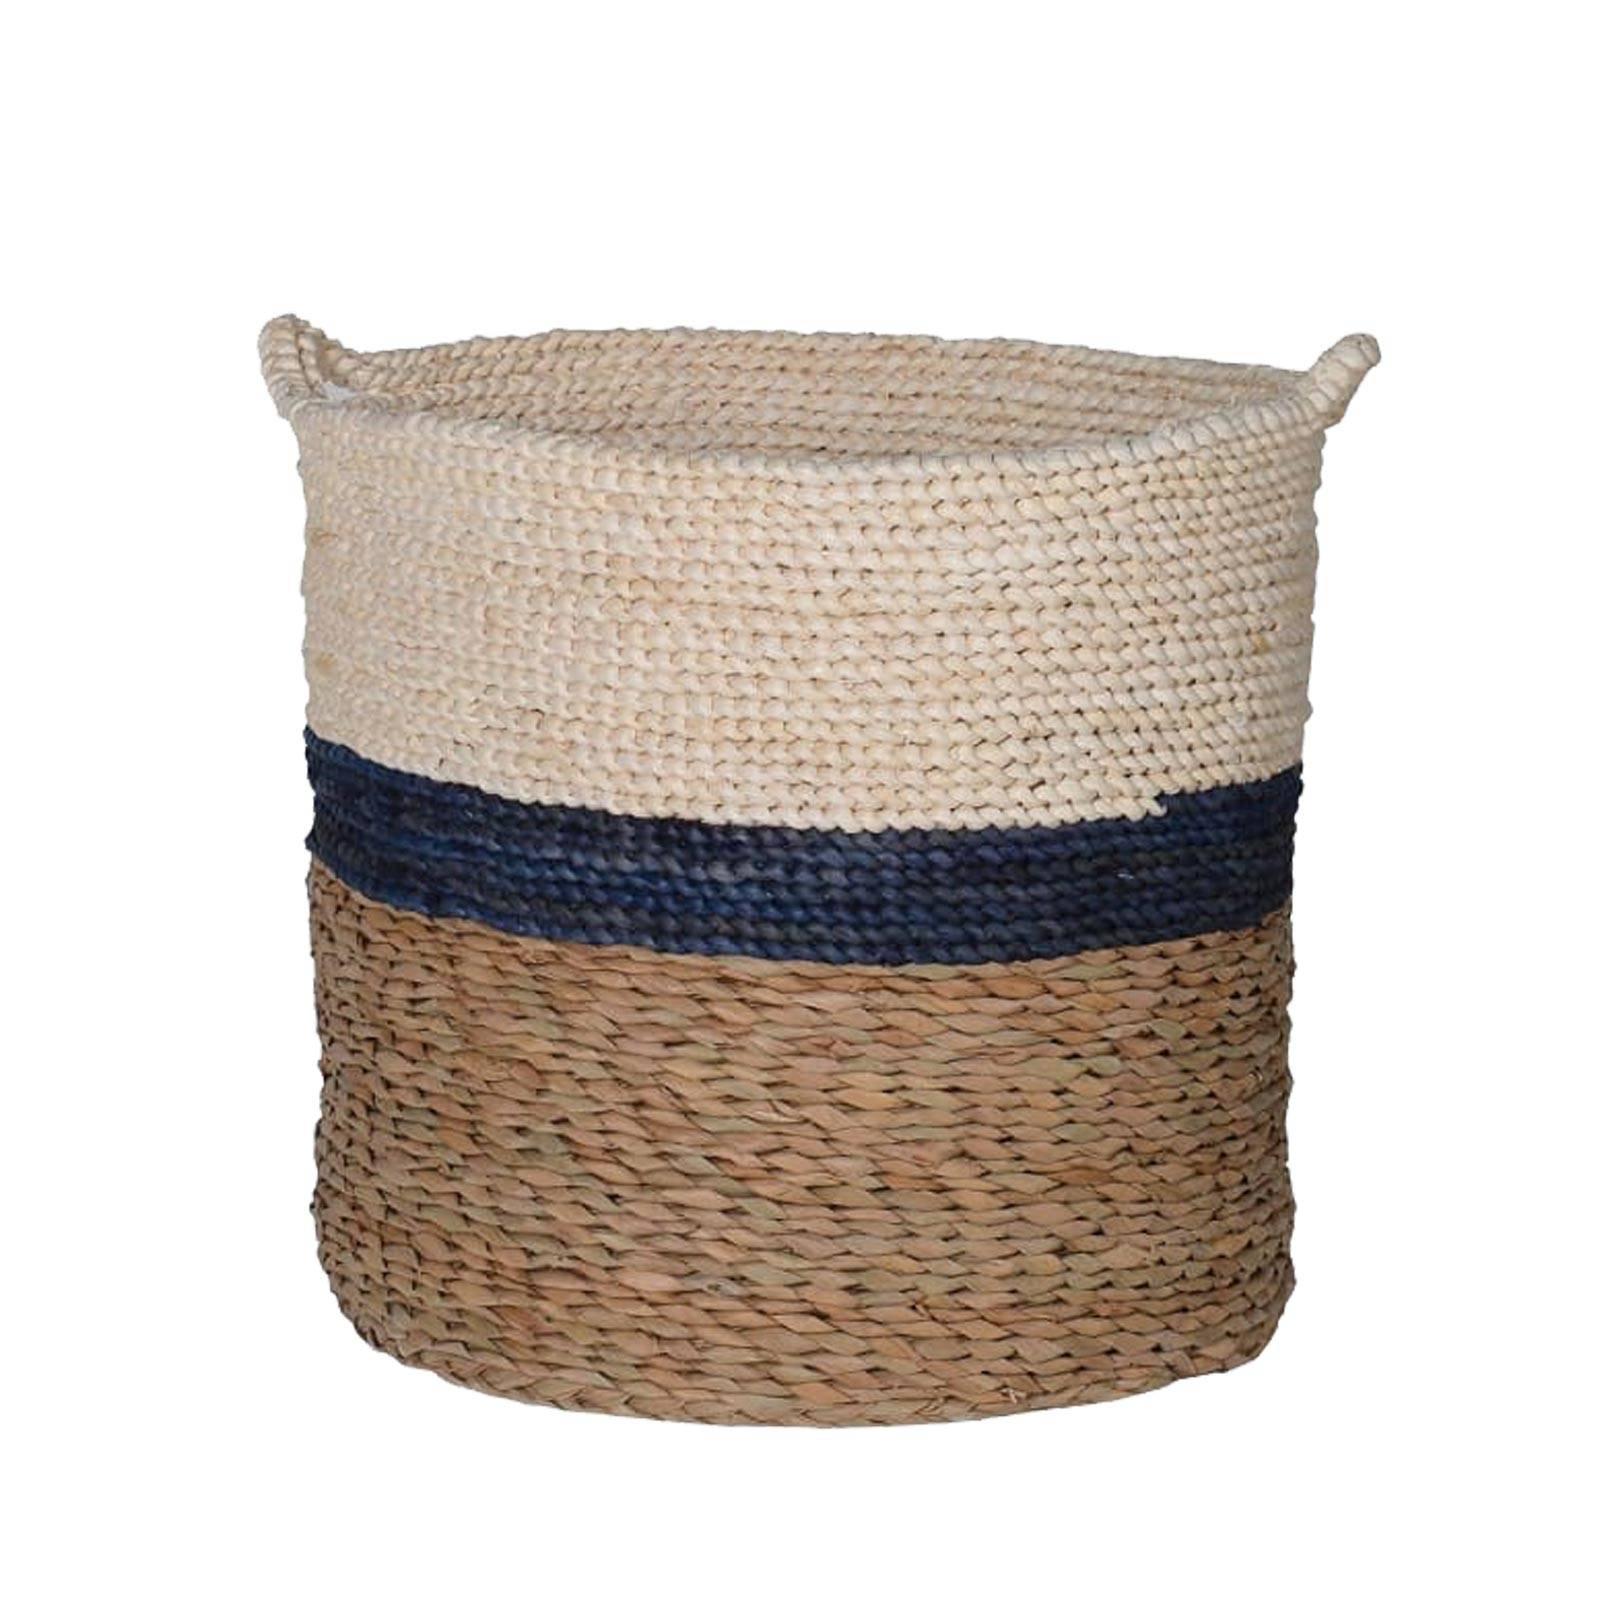 Navy, White & Brown Stripe Straw Basket With Handles